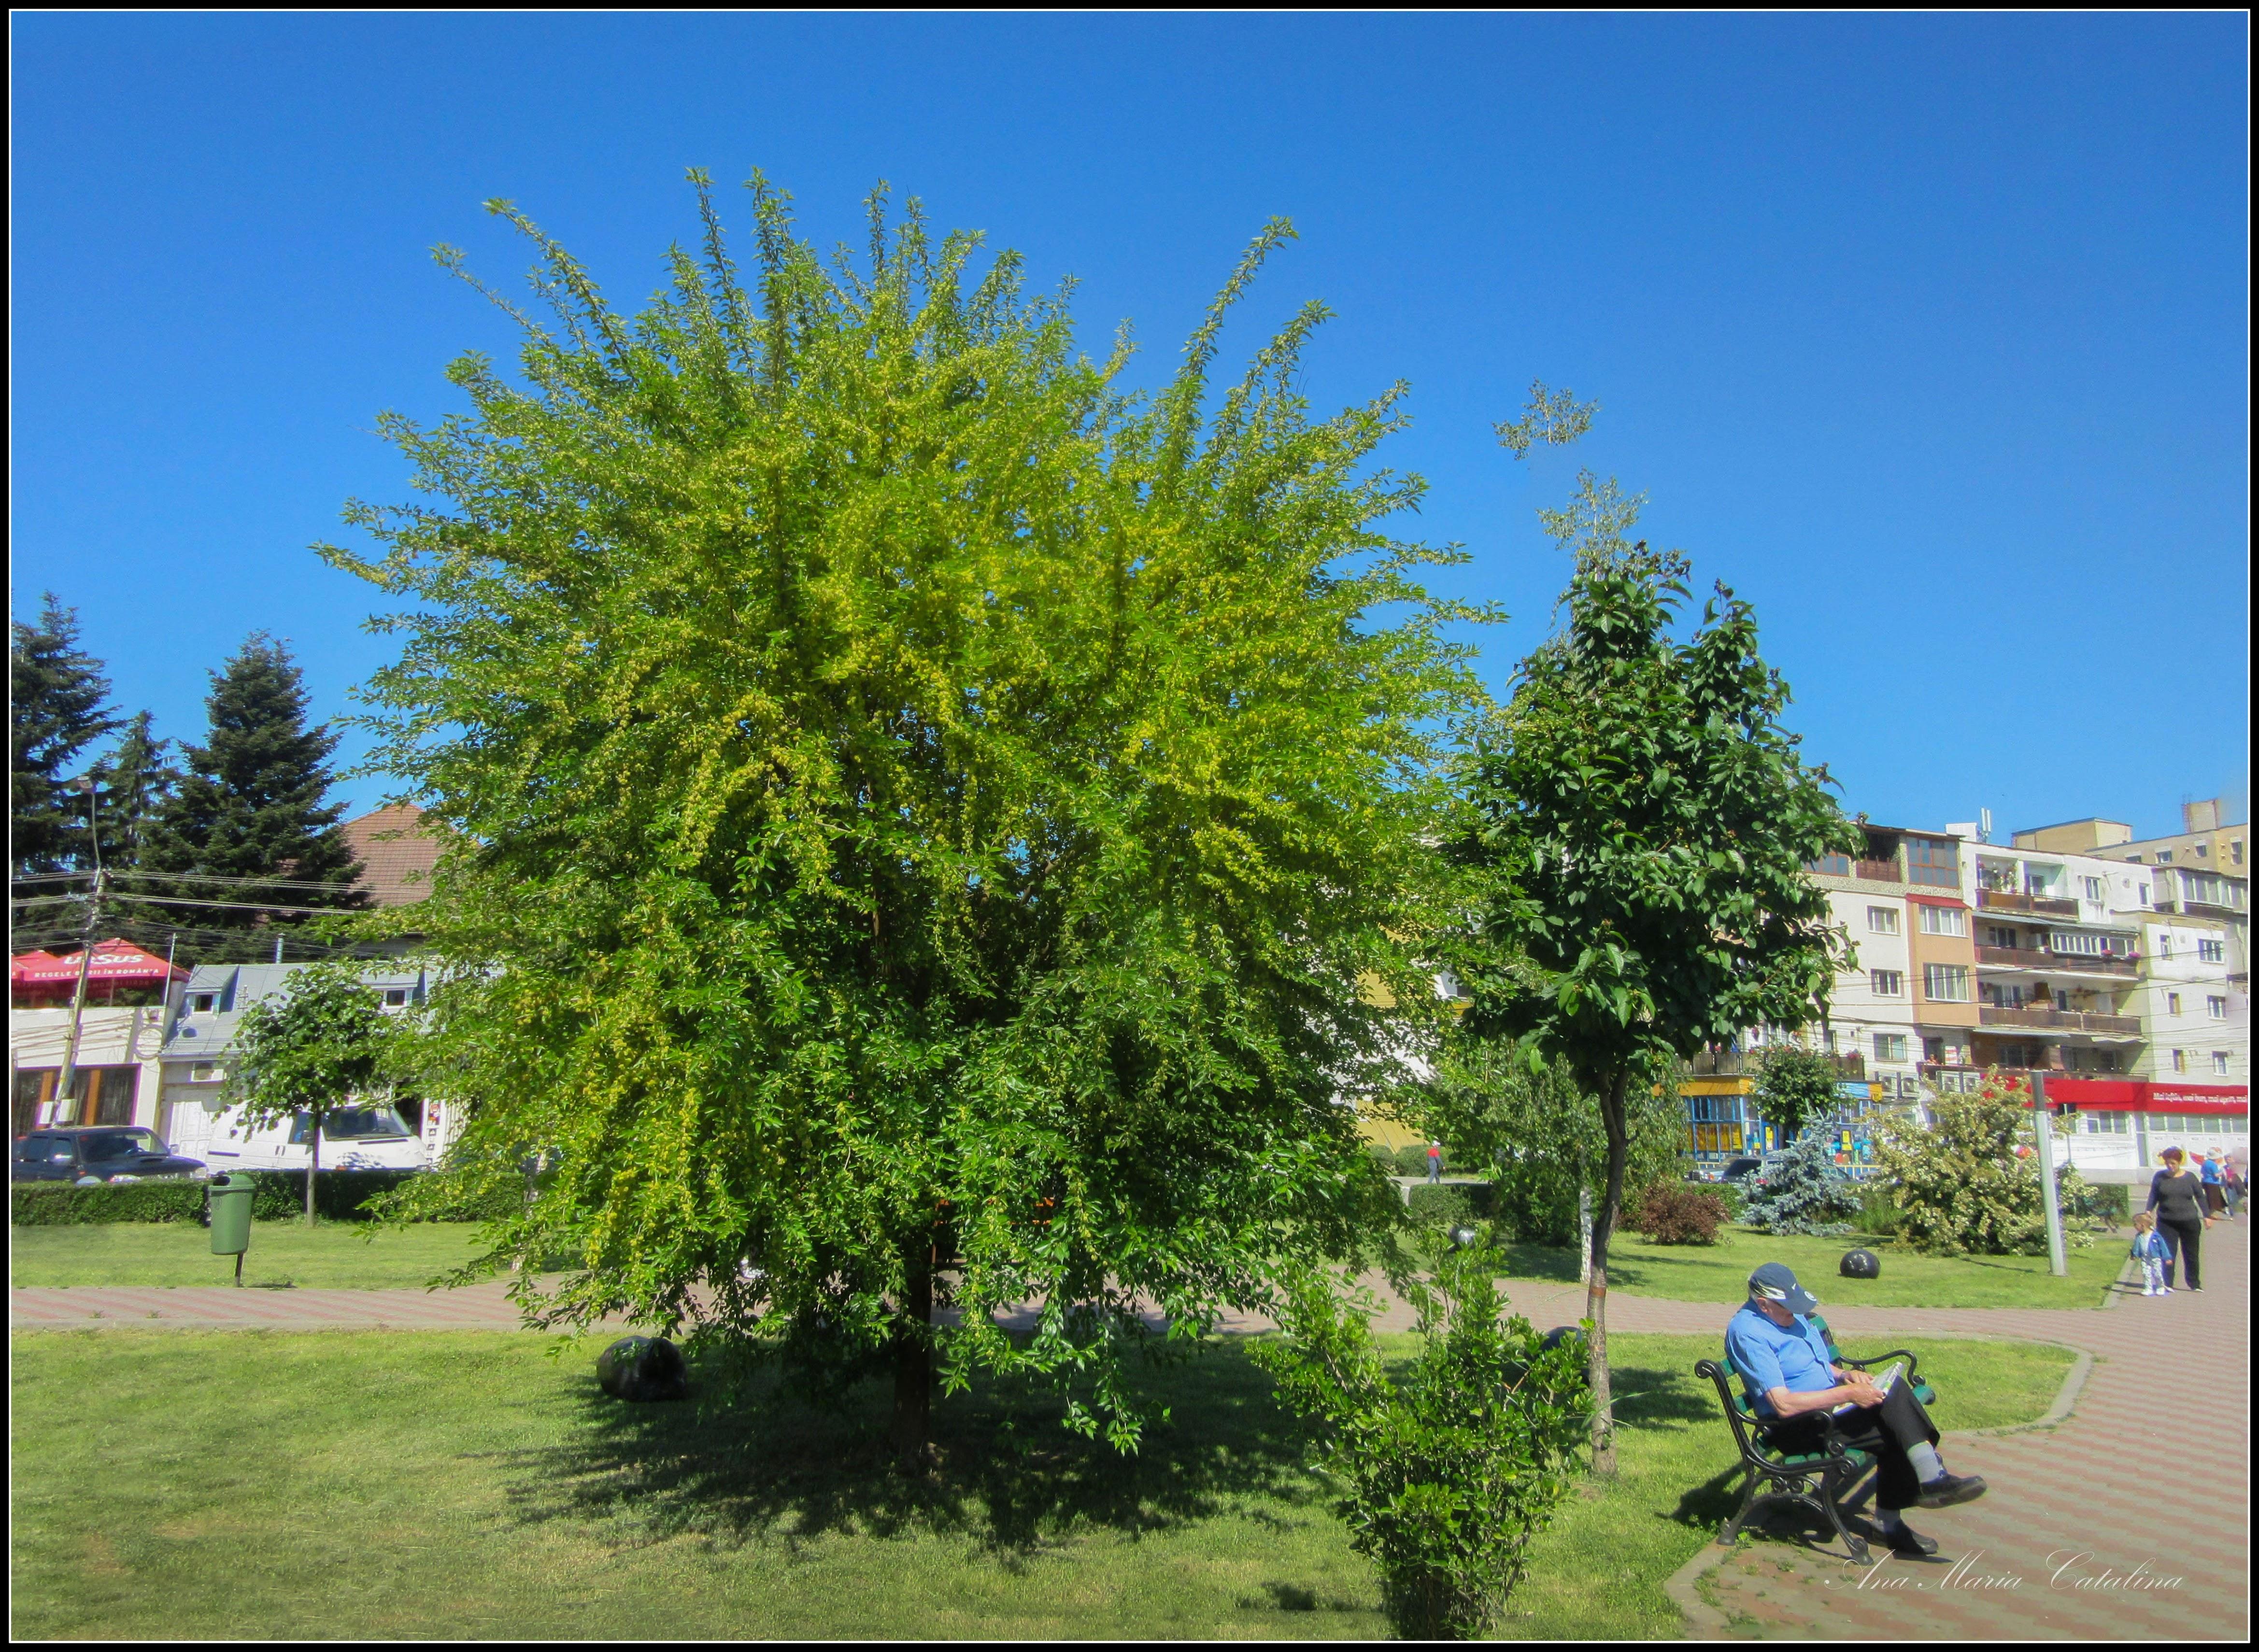 Photo: Roșcovul (Ceratonia siliqua) - din Parcul teilor - 2017.05.29 Album http://ana-maria-catalina.blogspot.ro/2017/06/roscovul-album-pe-google13ceratonia.html